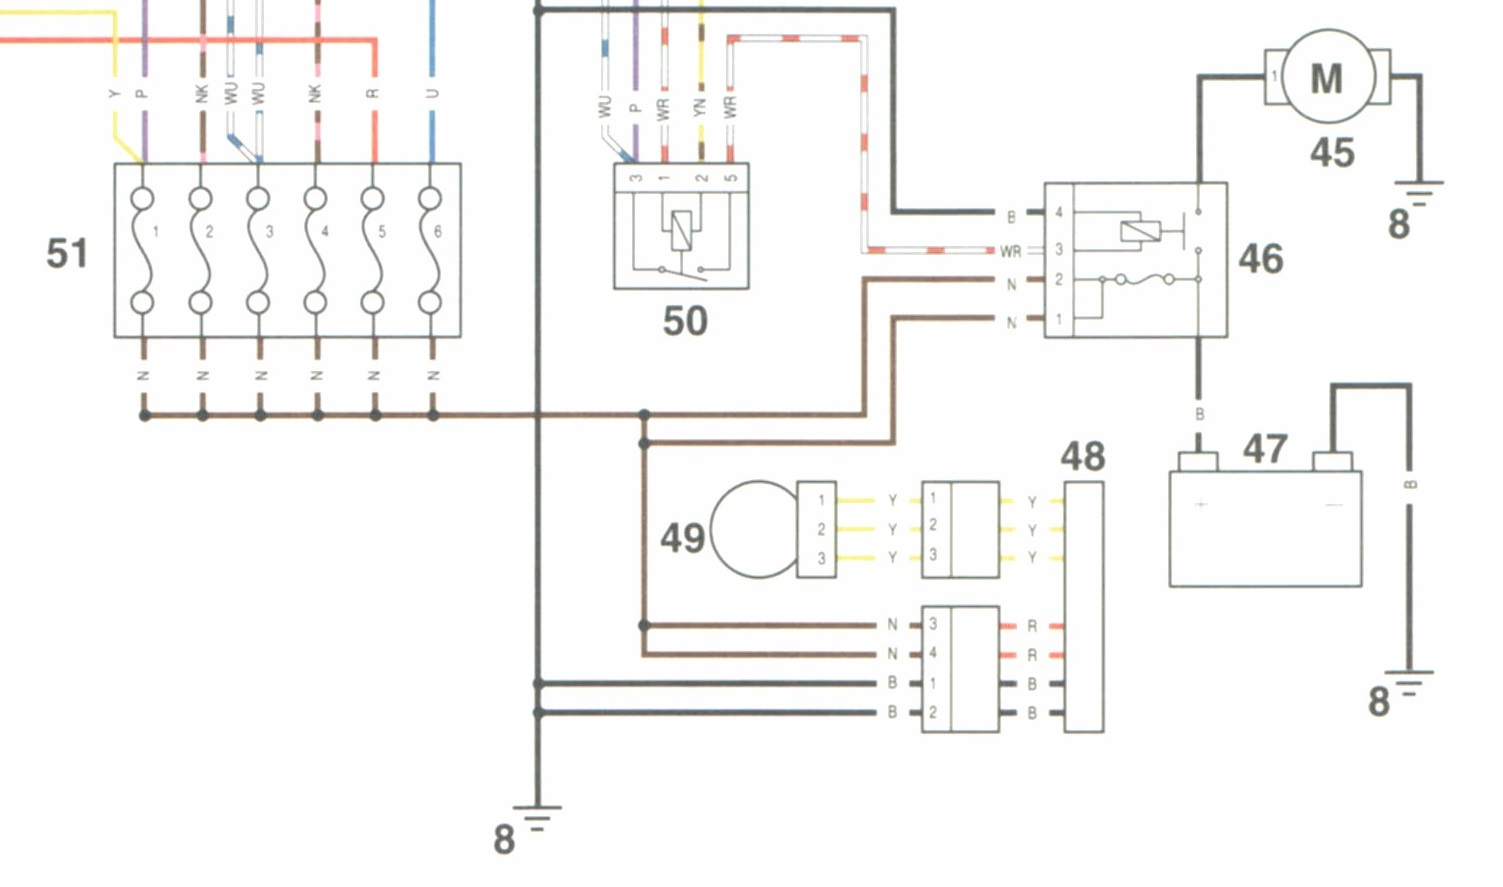 DIAGRAM] 40 Daytona 40 Wiring Diagram Picture FULL Version HD ...